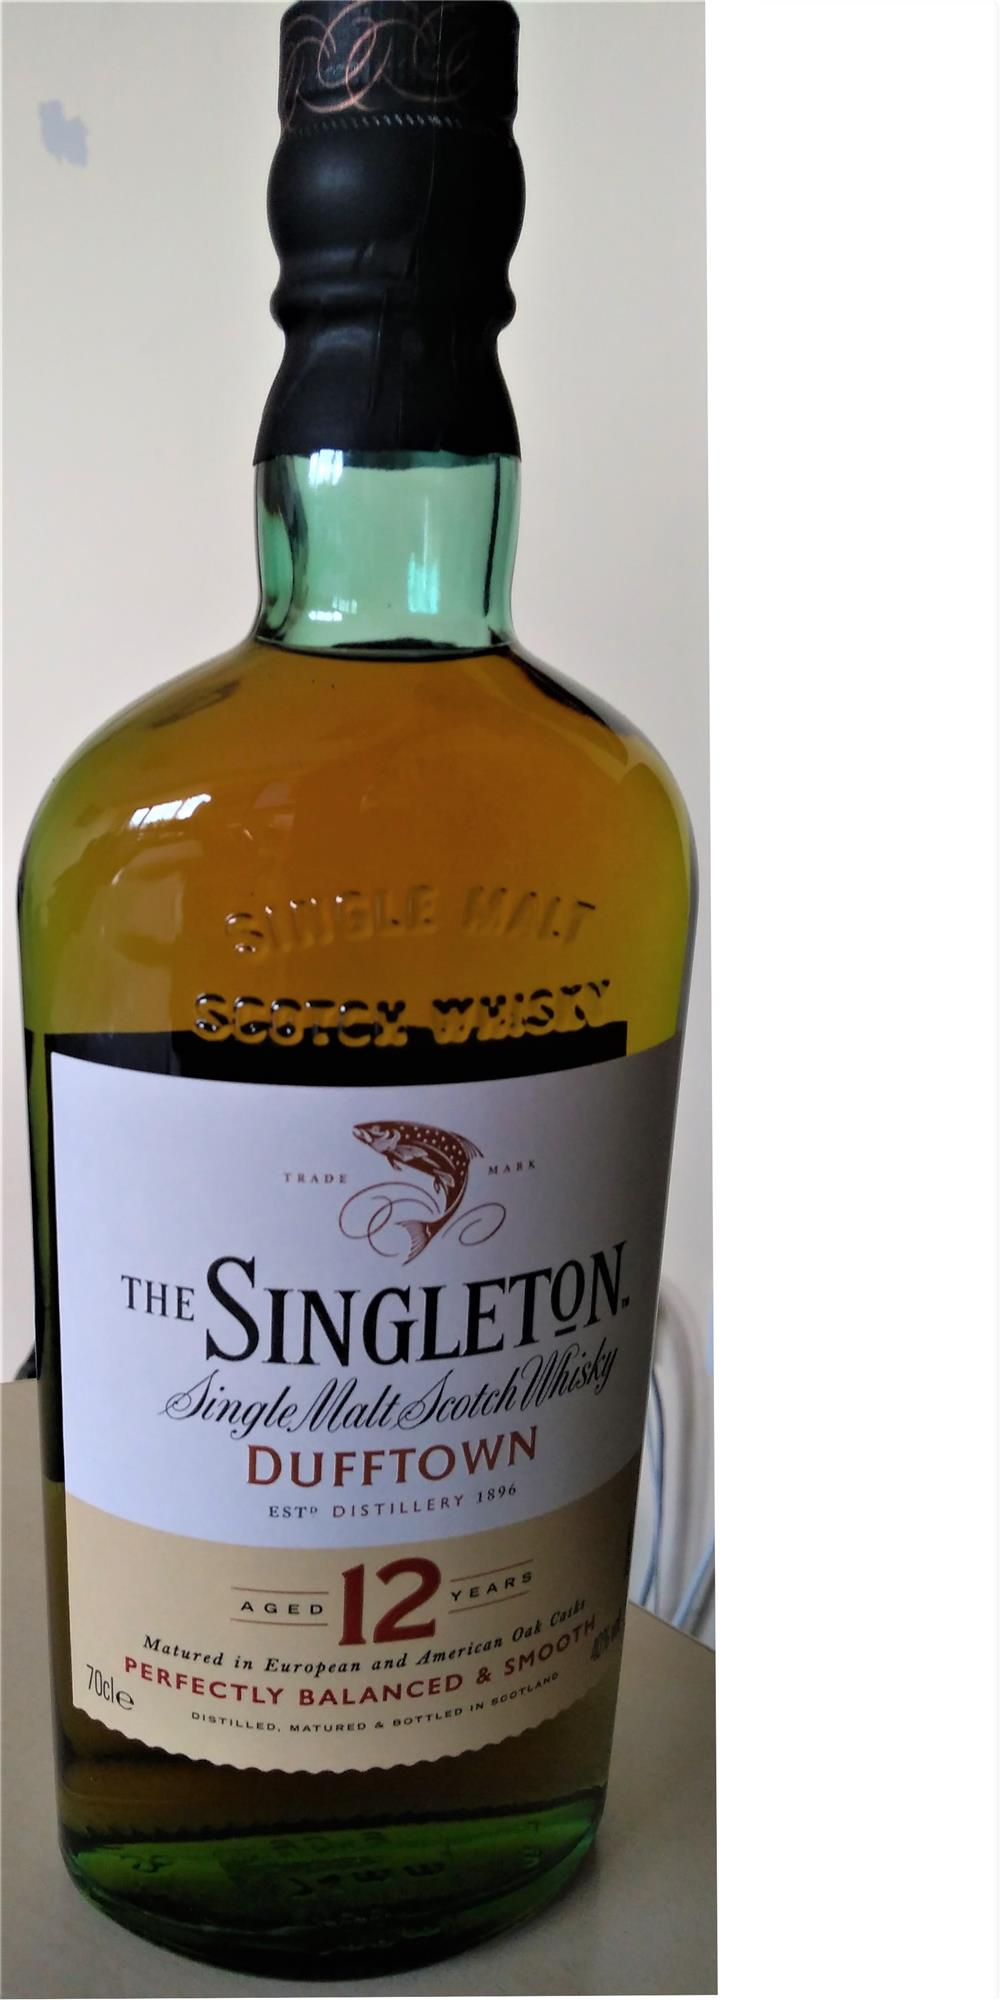 Singleton of Dufftown - single malt scotch whisky